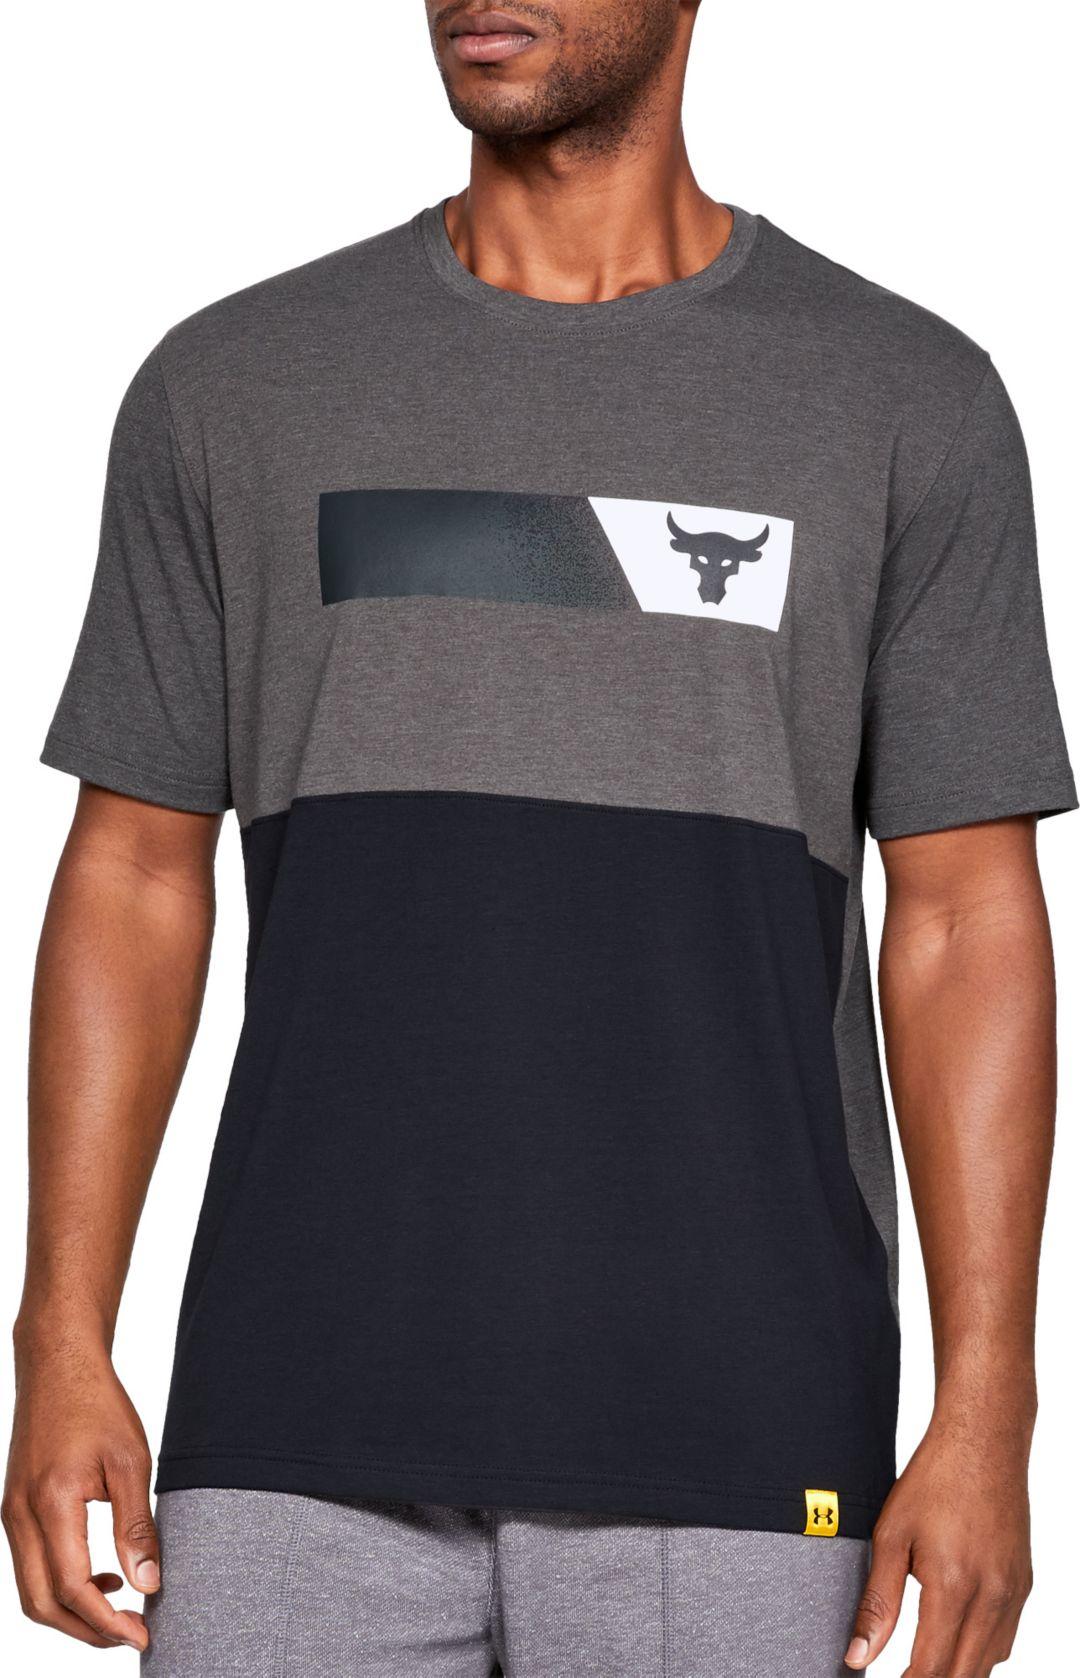 c5d979f32 Under Armour Men's Project Rock Bar Graphic T-Shirt   DICK'S ...